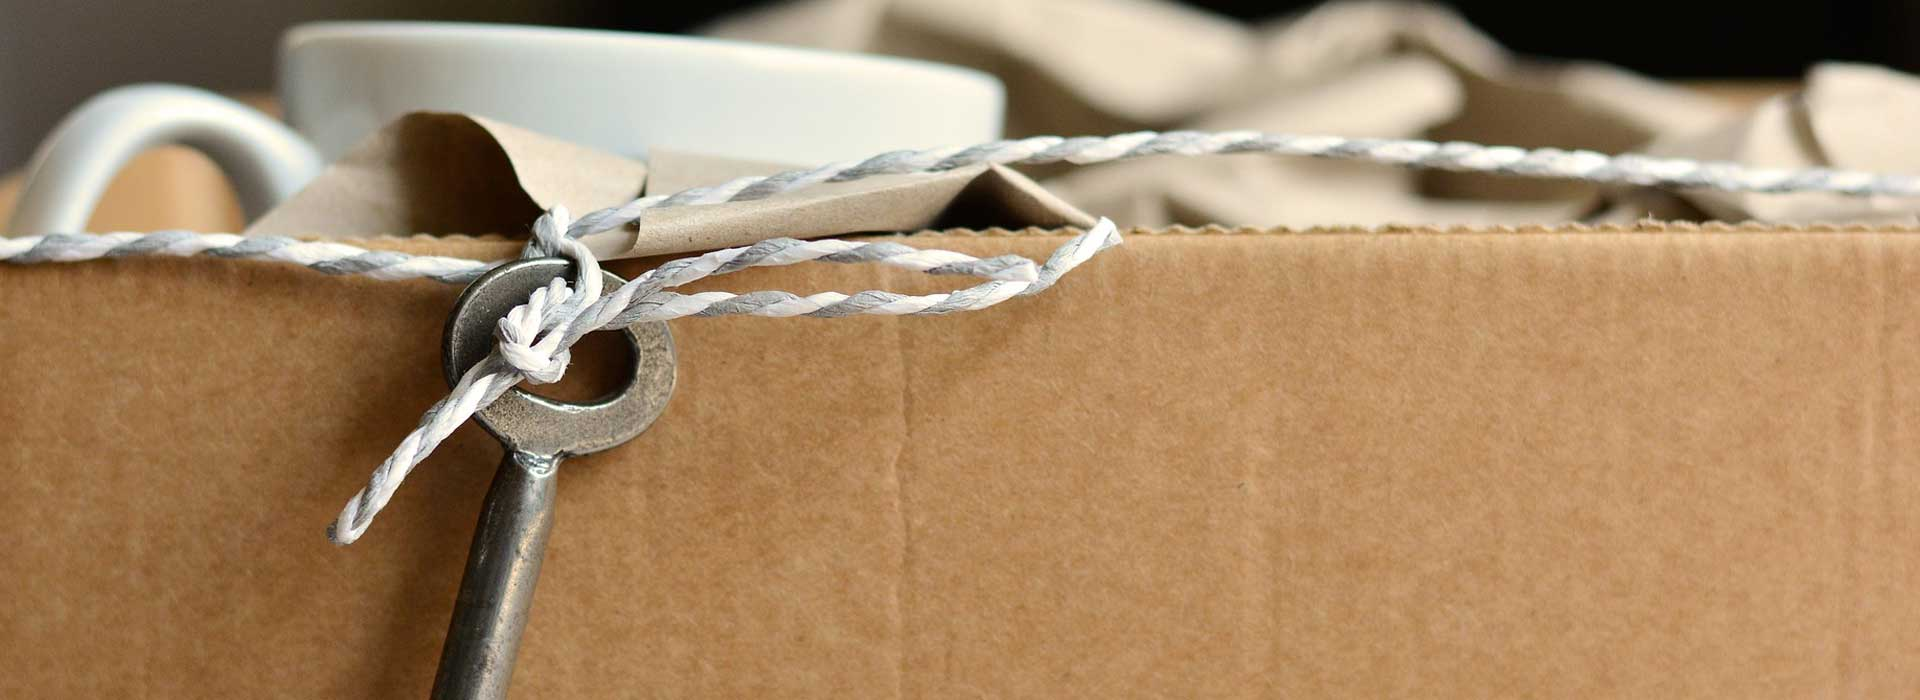 verpackungen-aus-wellpappe-stabil